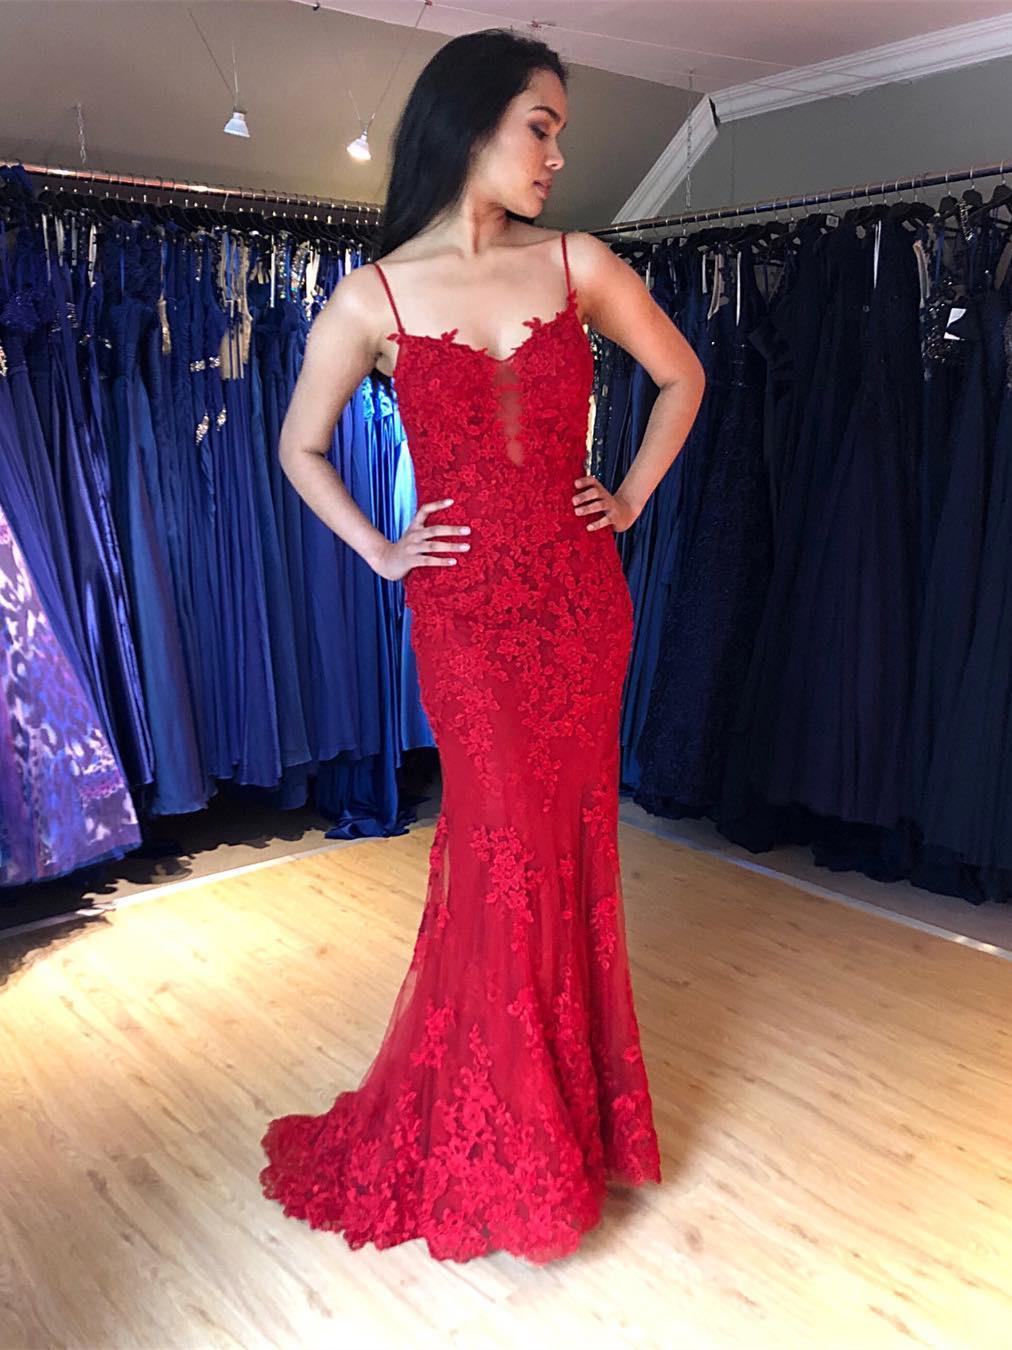 Meerjungfrau Rückenfreies Abendkleid Abiballkleid Lang Rot Spitze Mit  Spaghettiträger